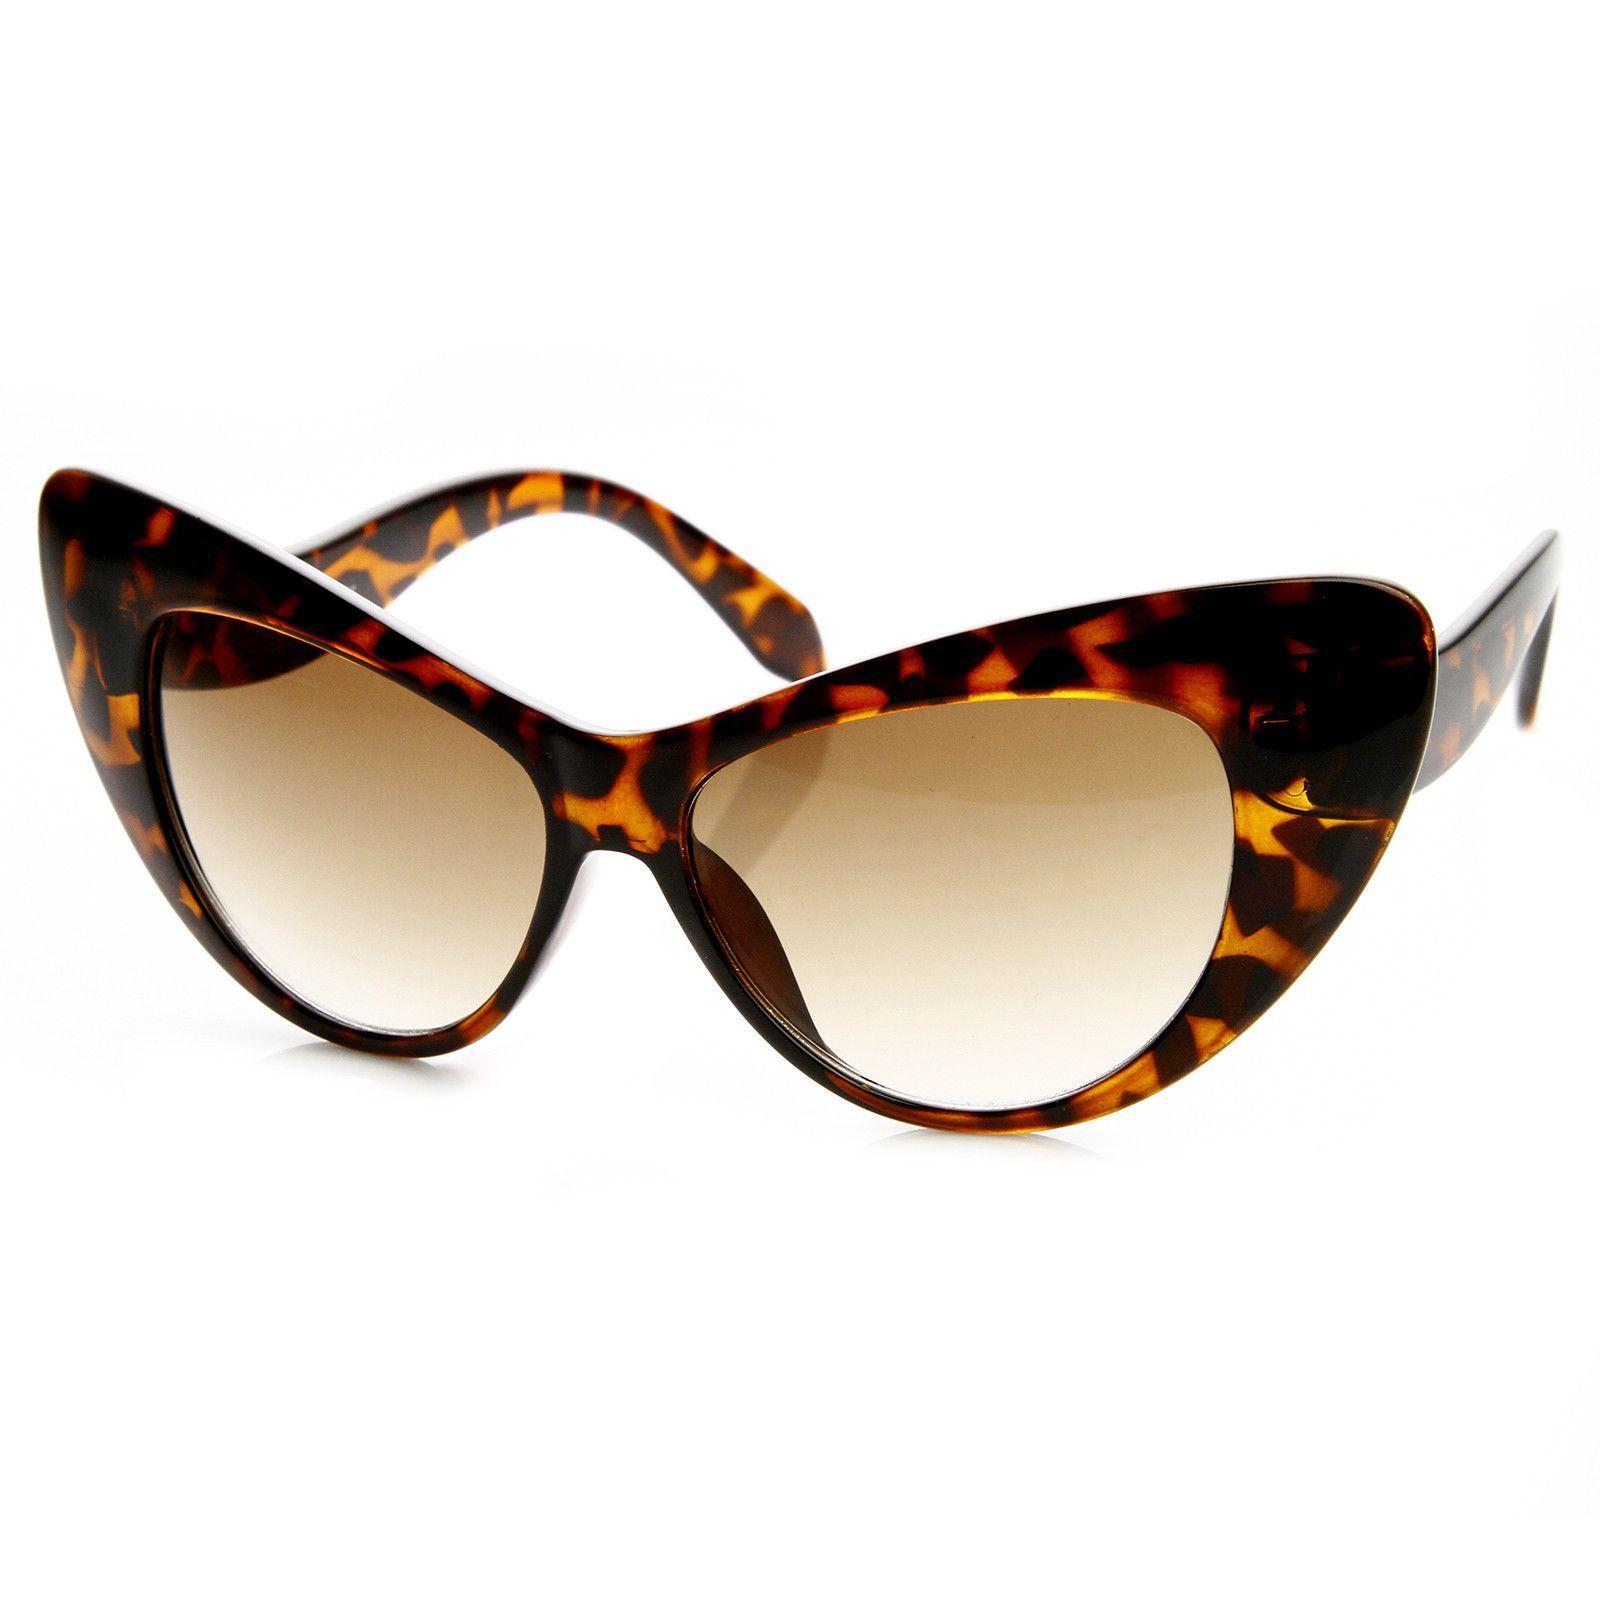 Designer Womens Oversize Retro Cat Eye Fashion Sunglasses 8938